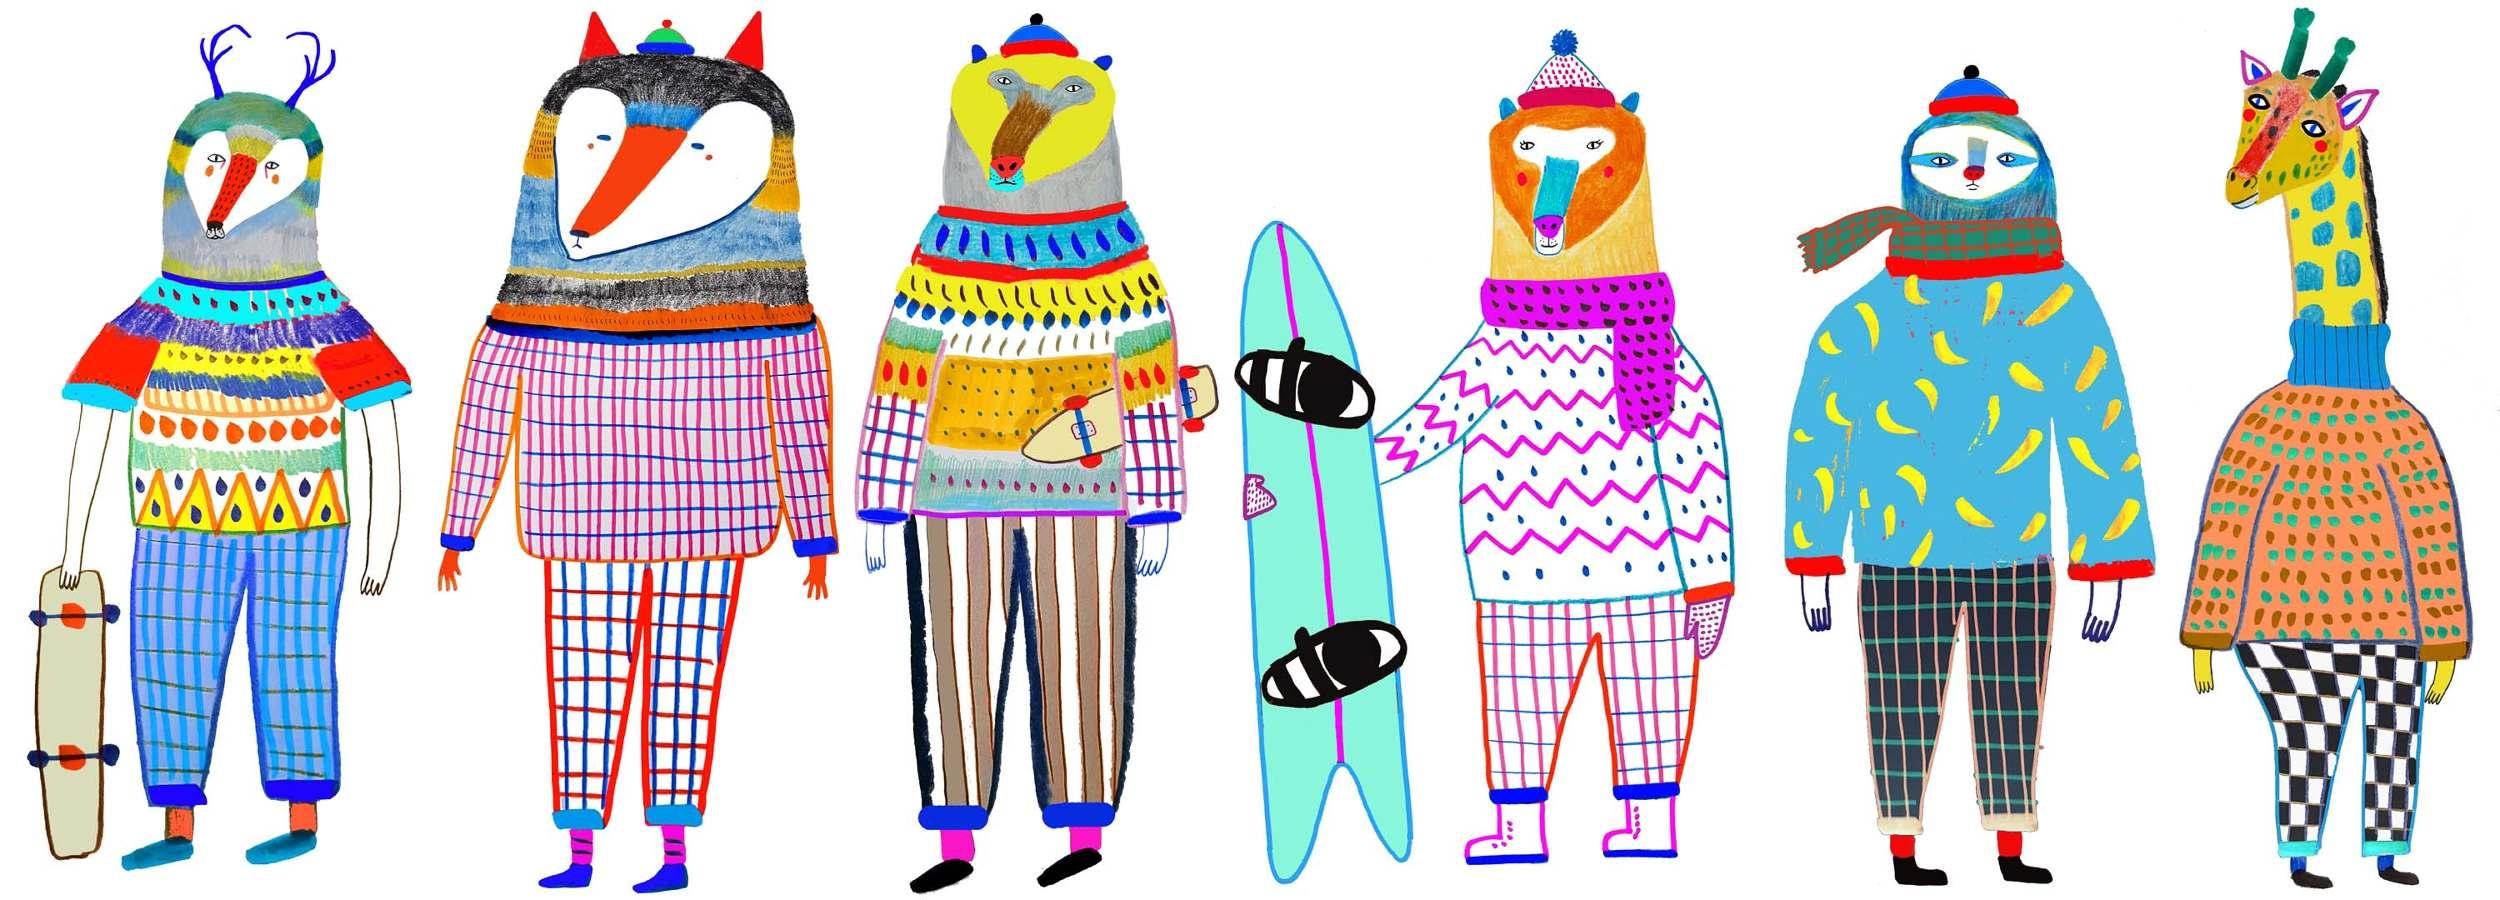 childrens book illustrator childrens illustration artist colorful